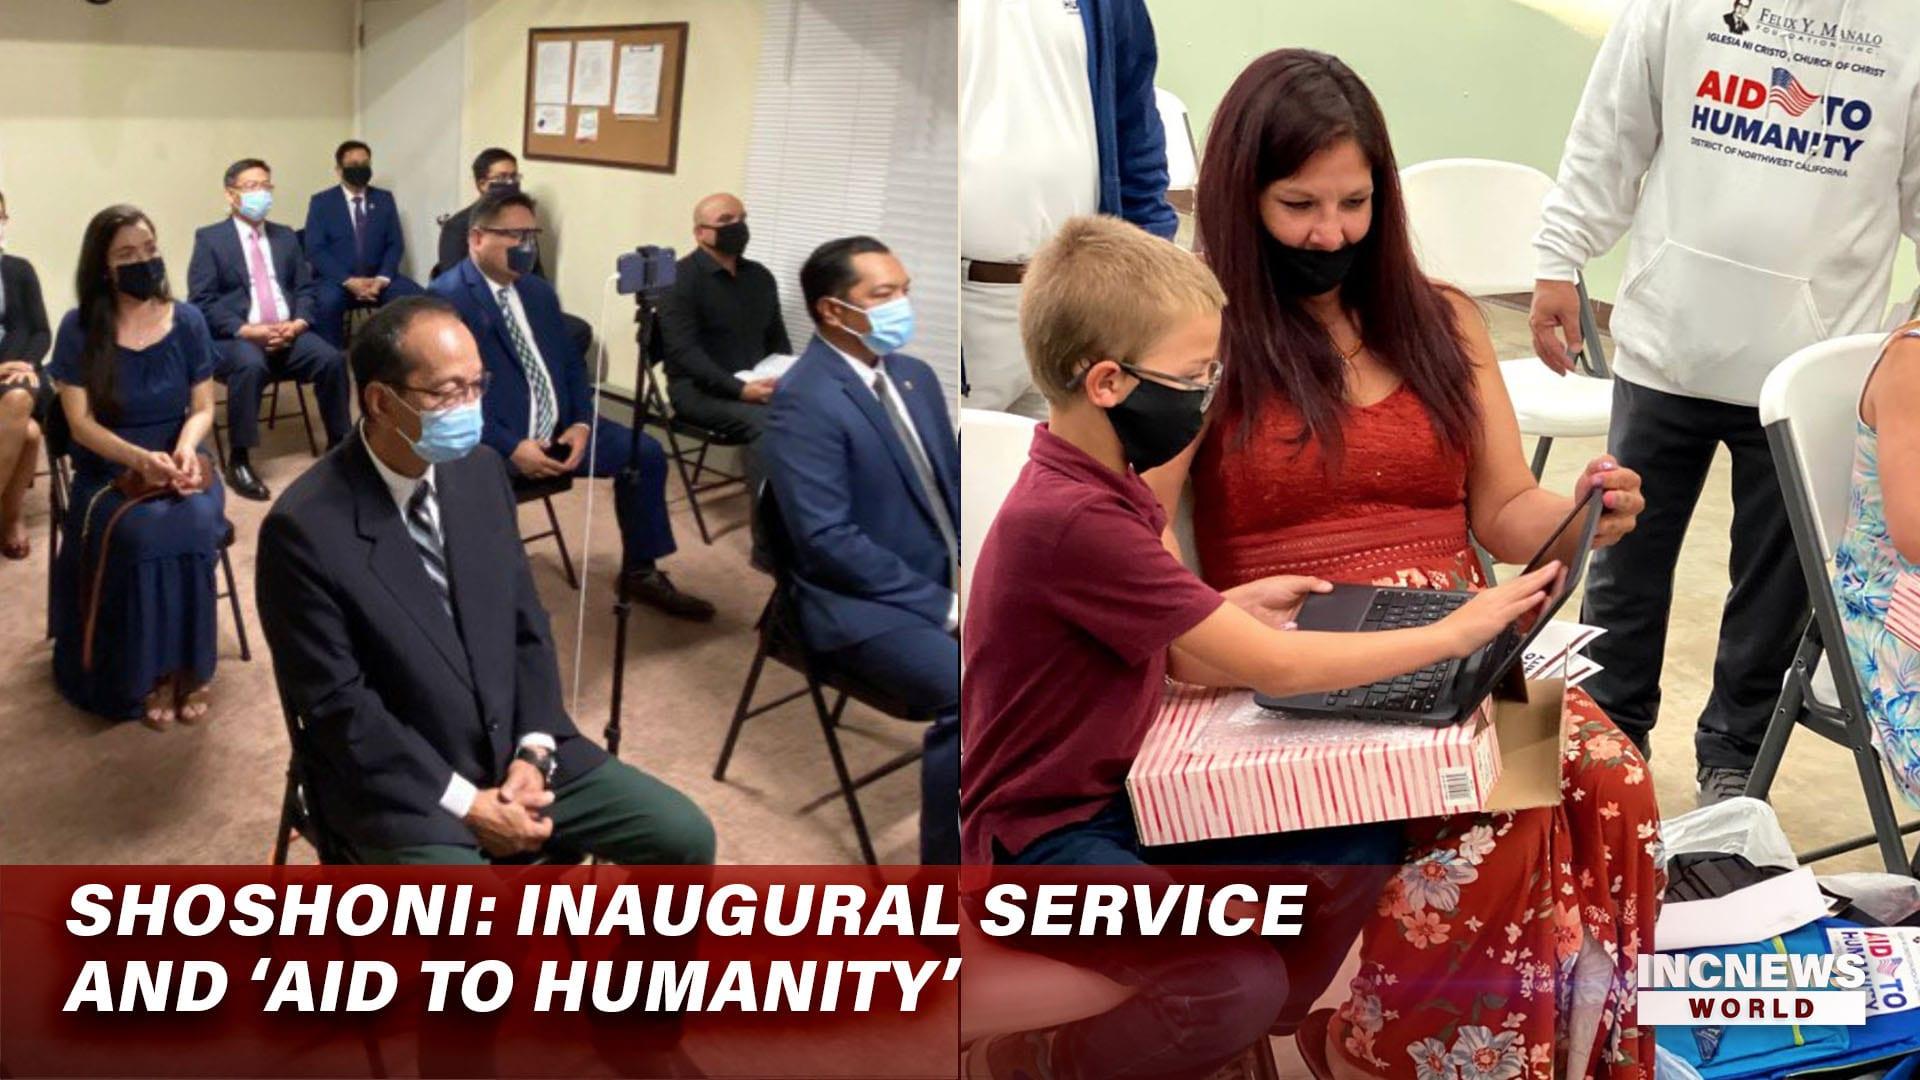 Shoshoni: Inaugural Service and 'Aid to Humanity'